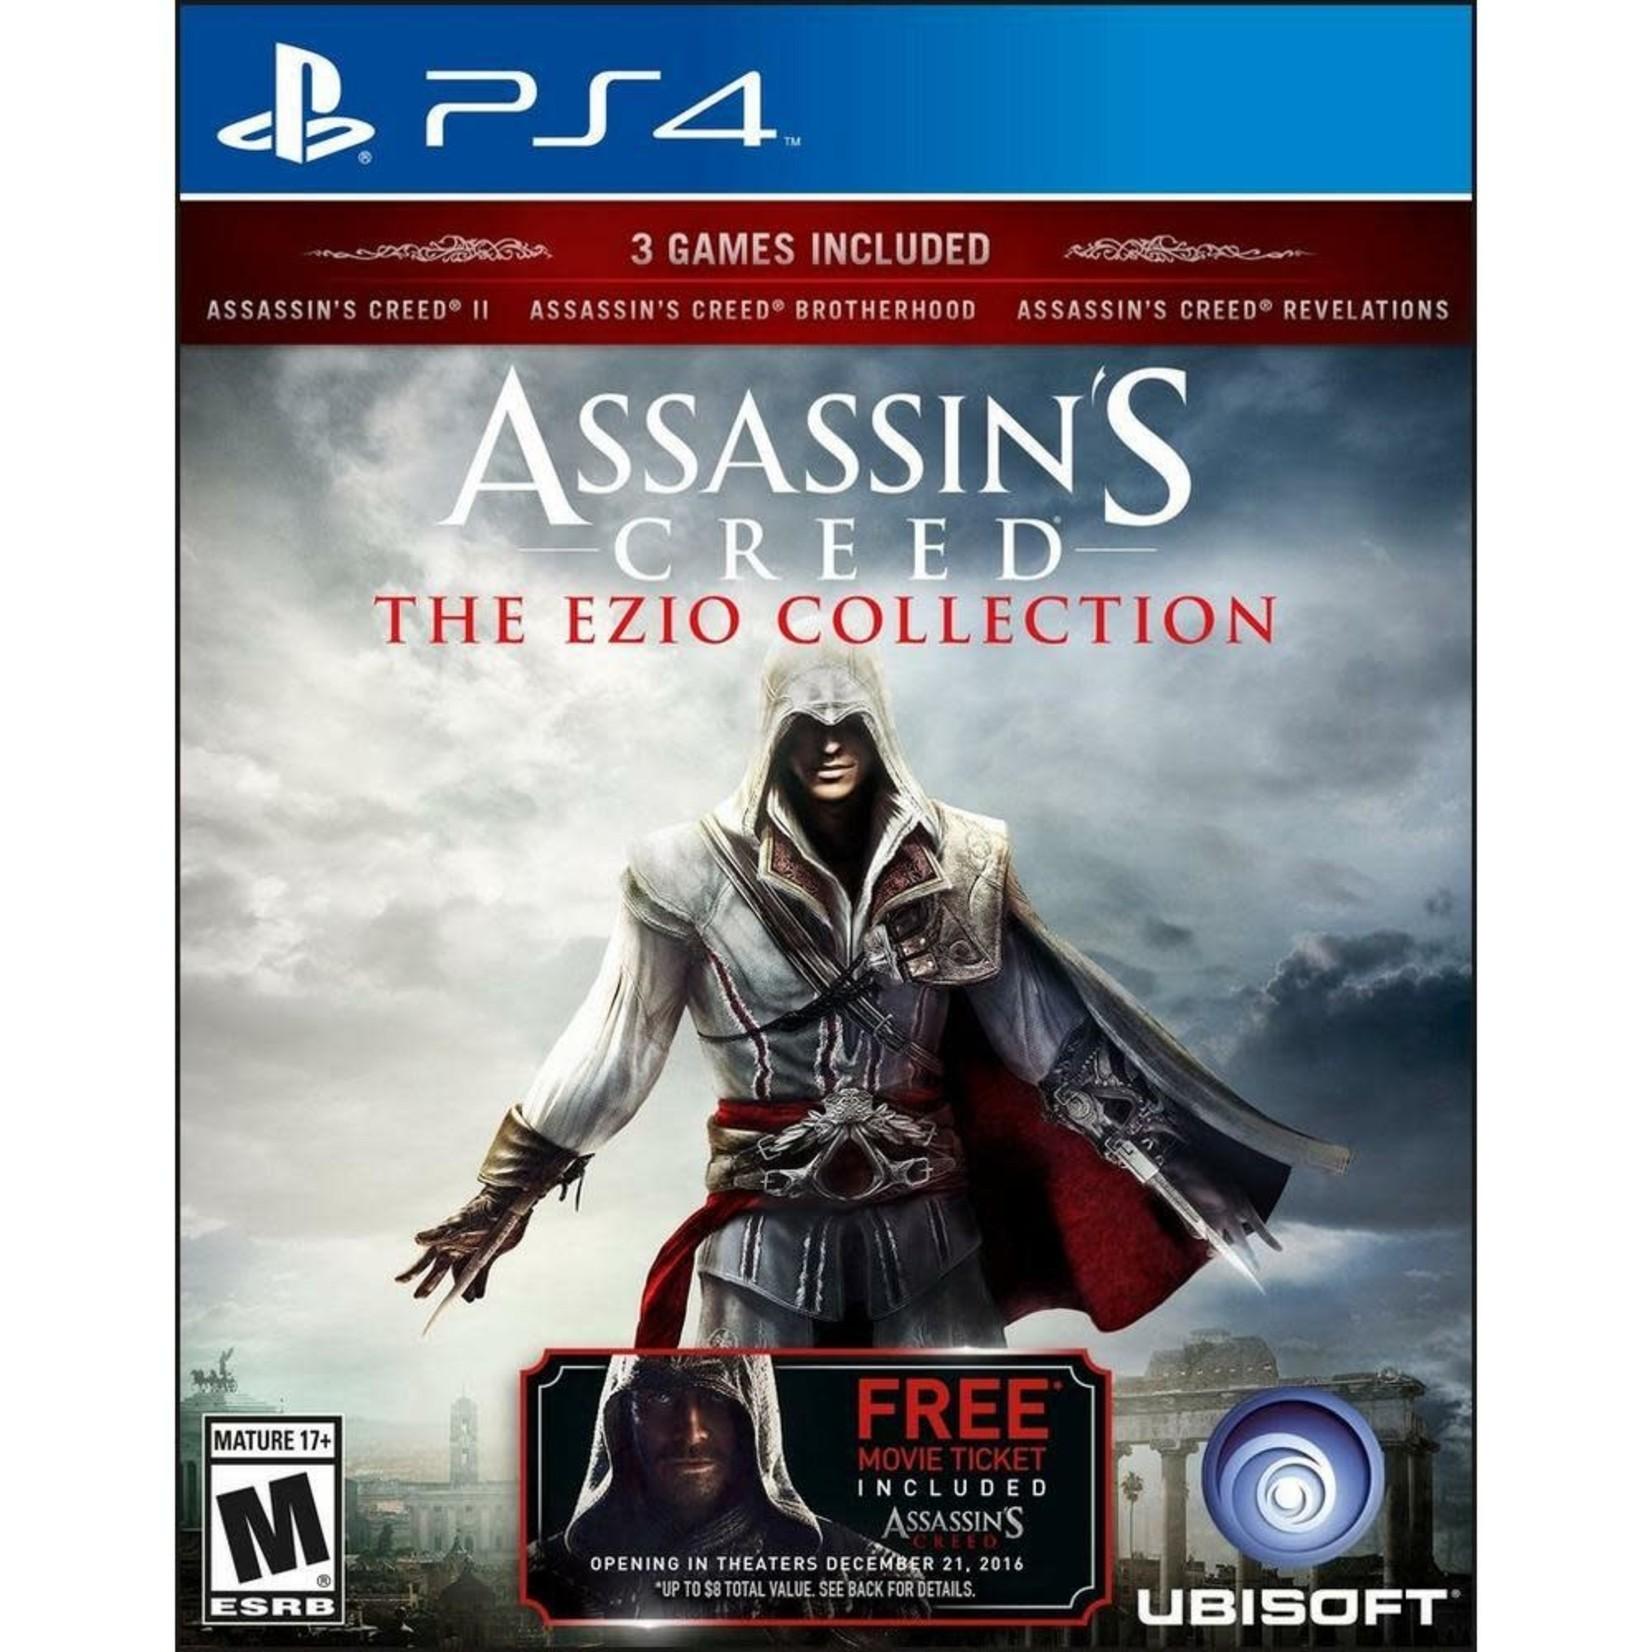 PS4U-Assassin's Creed: The Ezio Collection